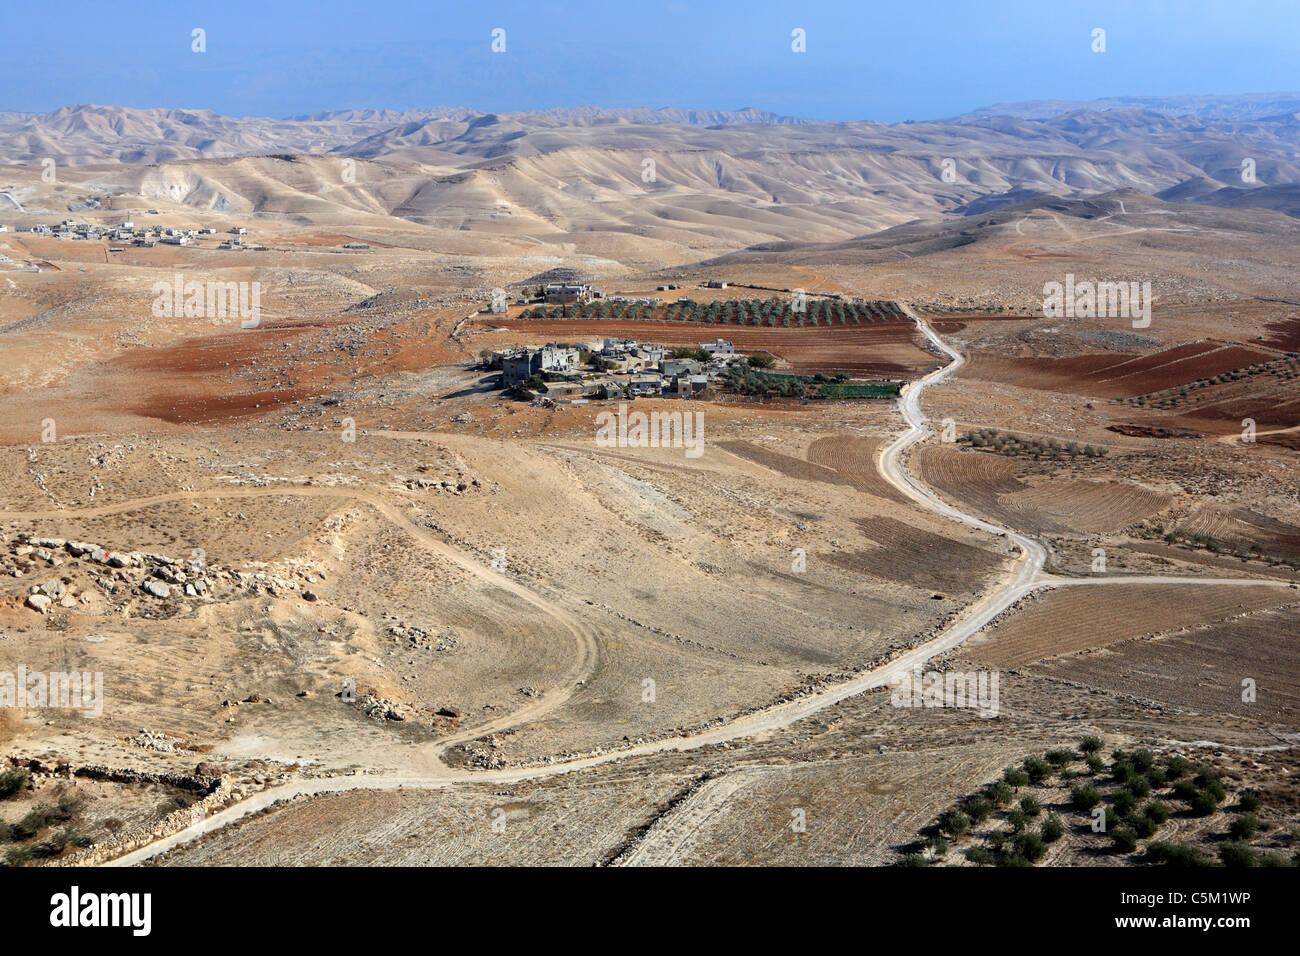 Palace of Herodes the Great (1st century BC), Herodion (Herodium), Israel - Stock Image